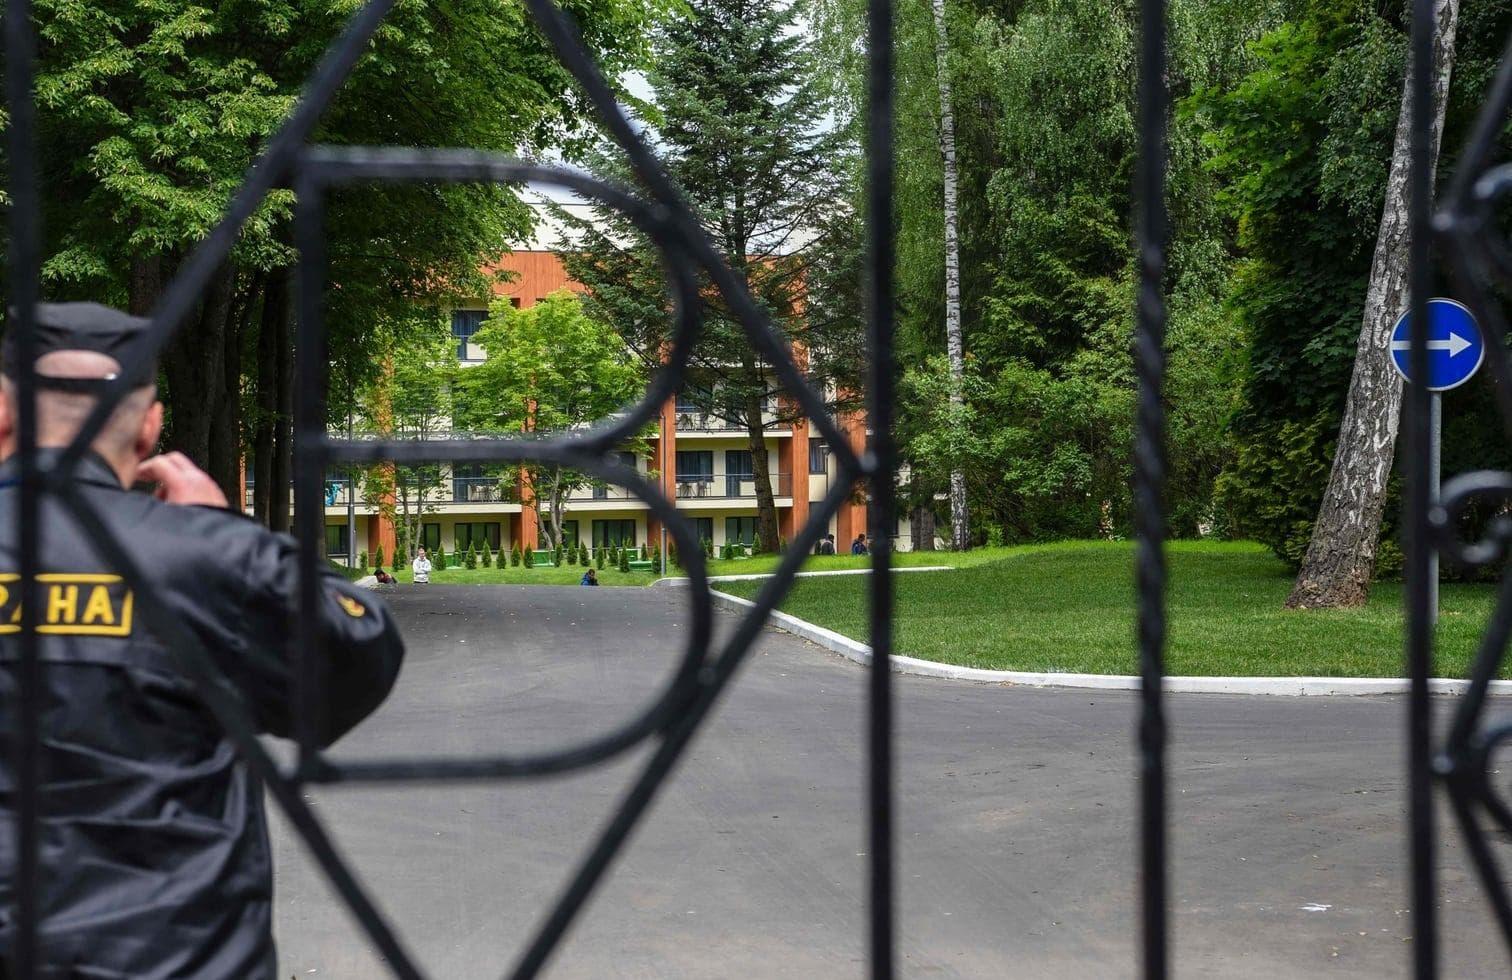 <p>Circa 95 Hektar Wald umgeben das Hotel.</p> Foto: AFP